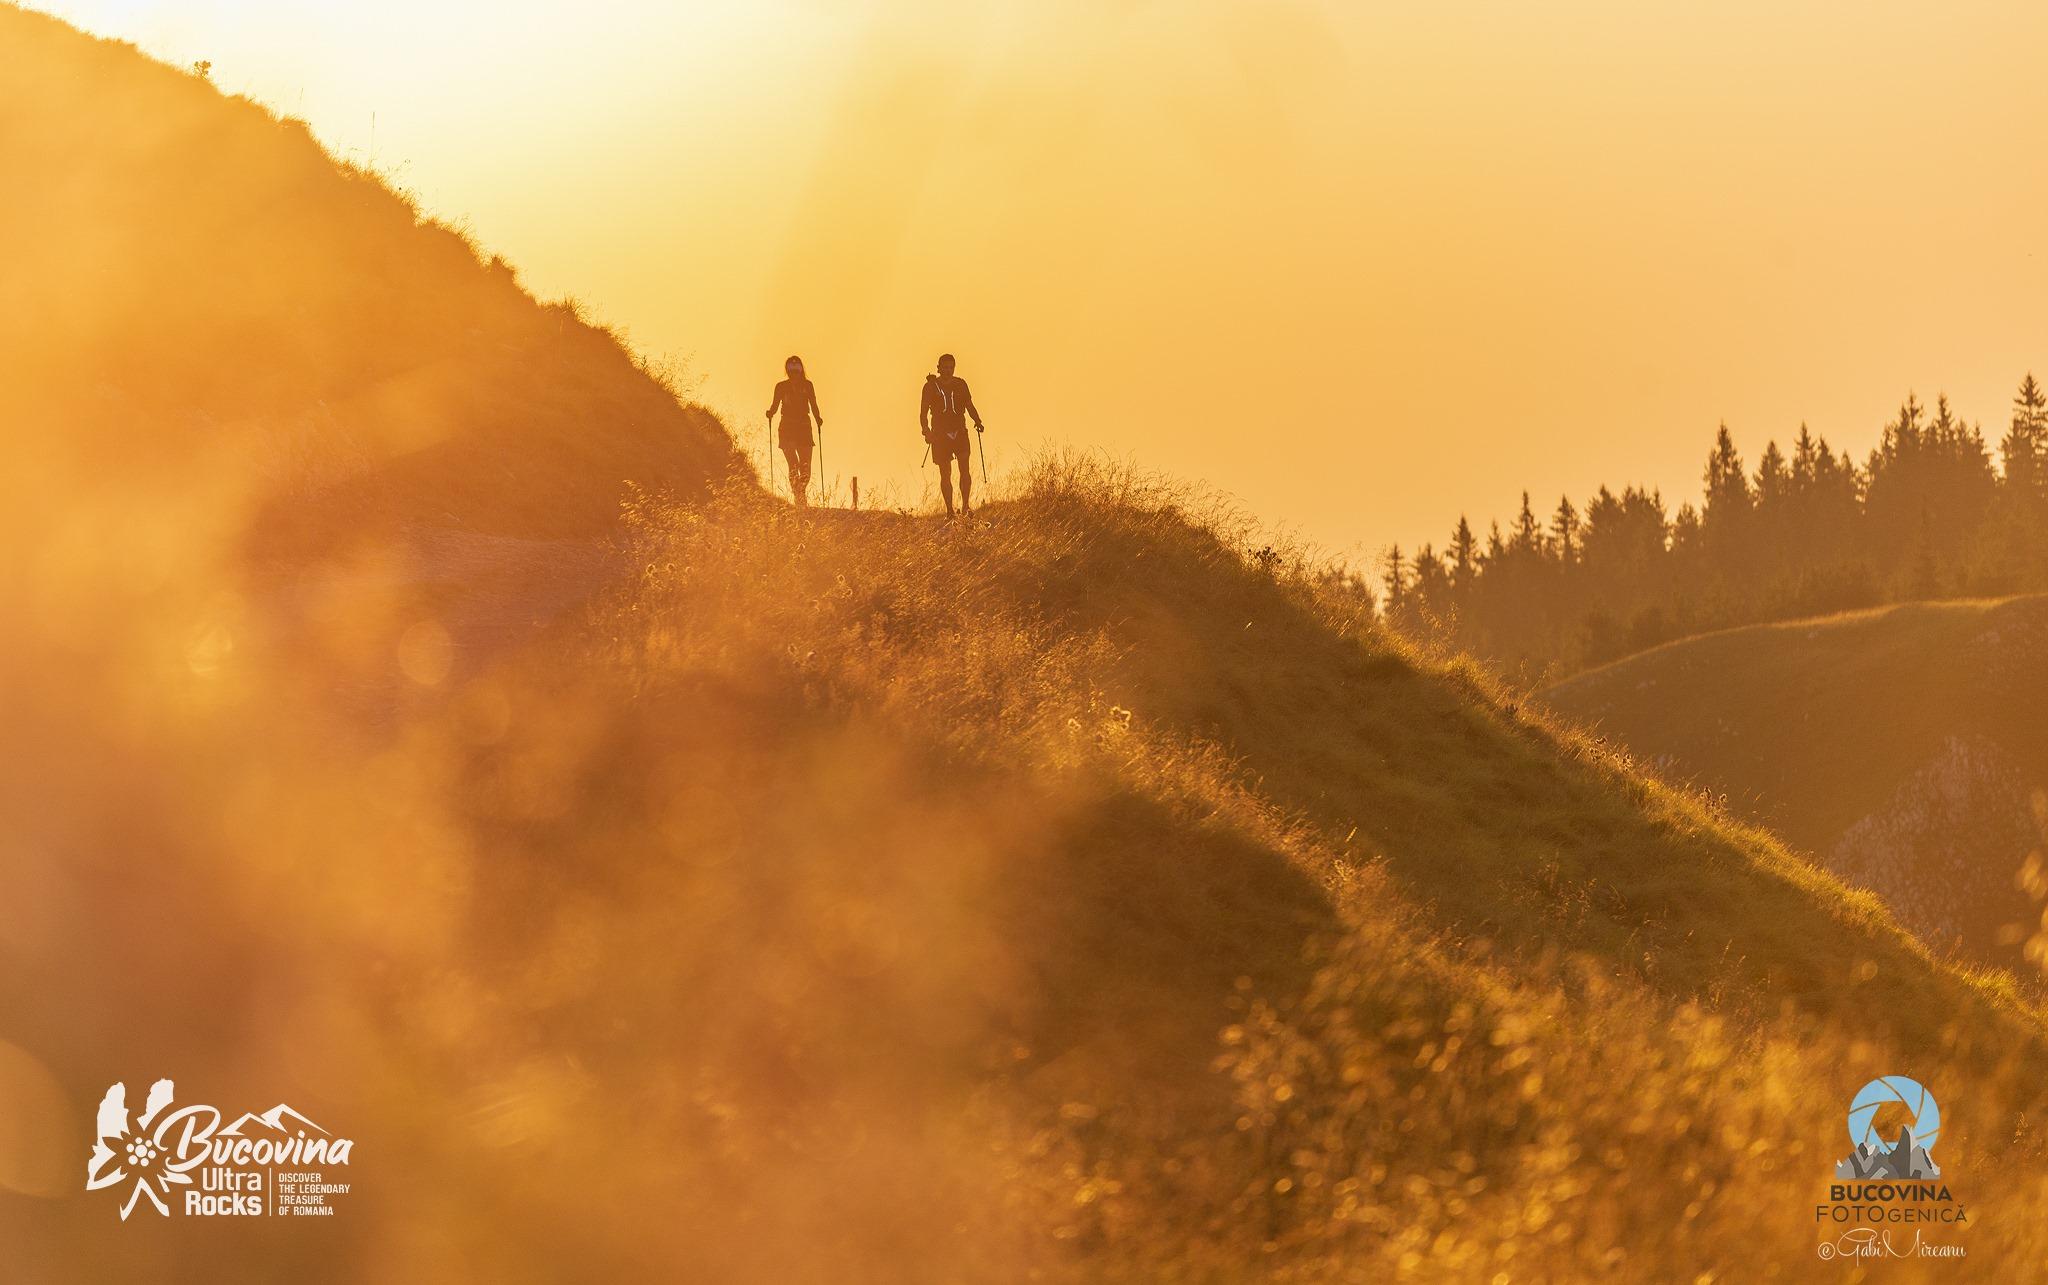 TrailRunning Academy - Bucovina Ultra Rocks 2021